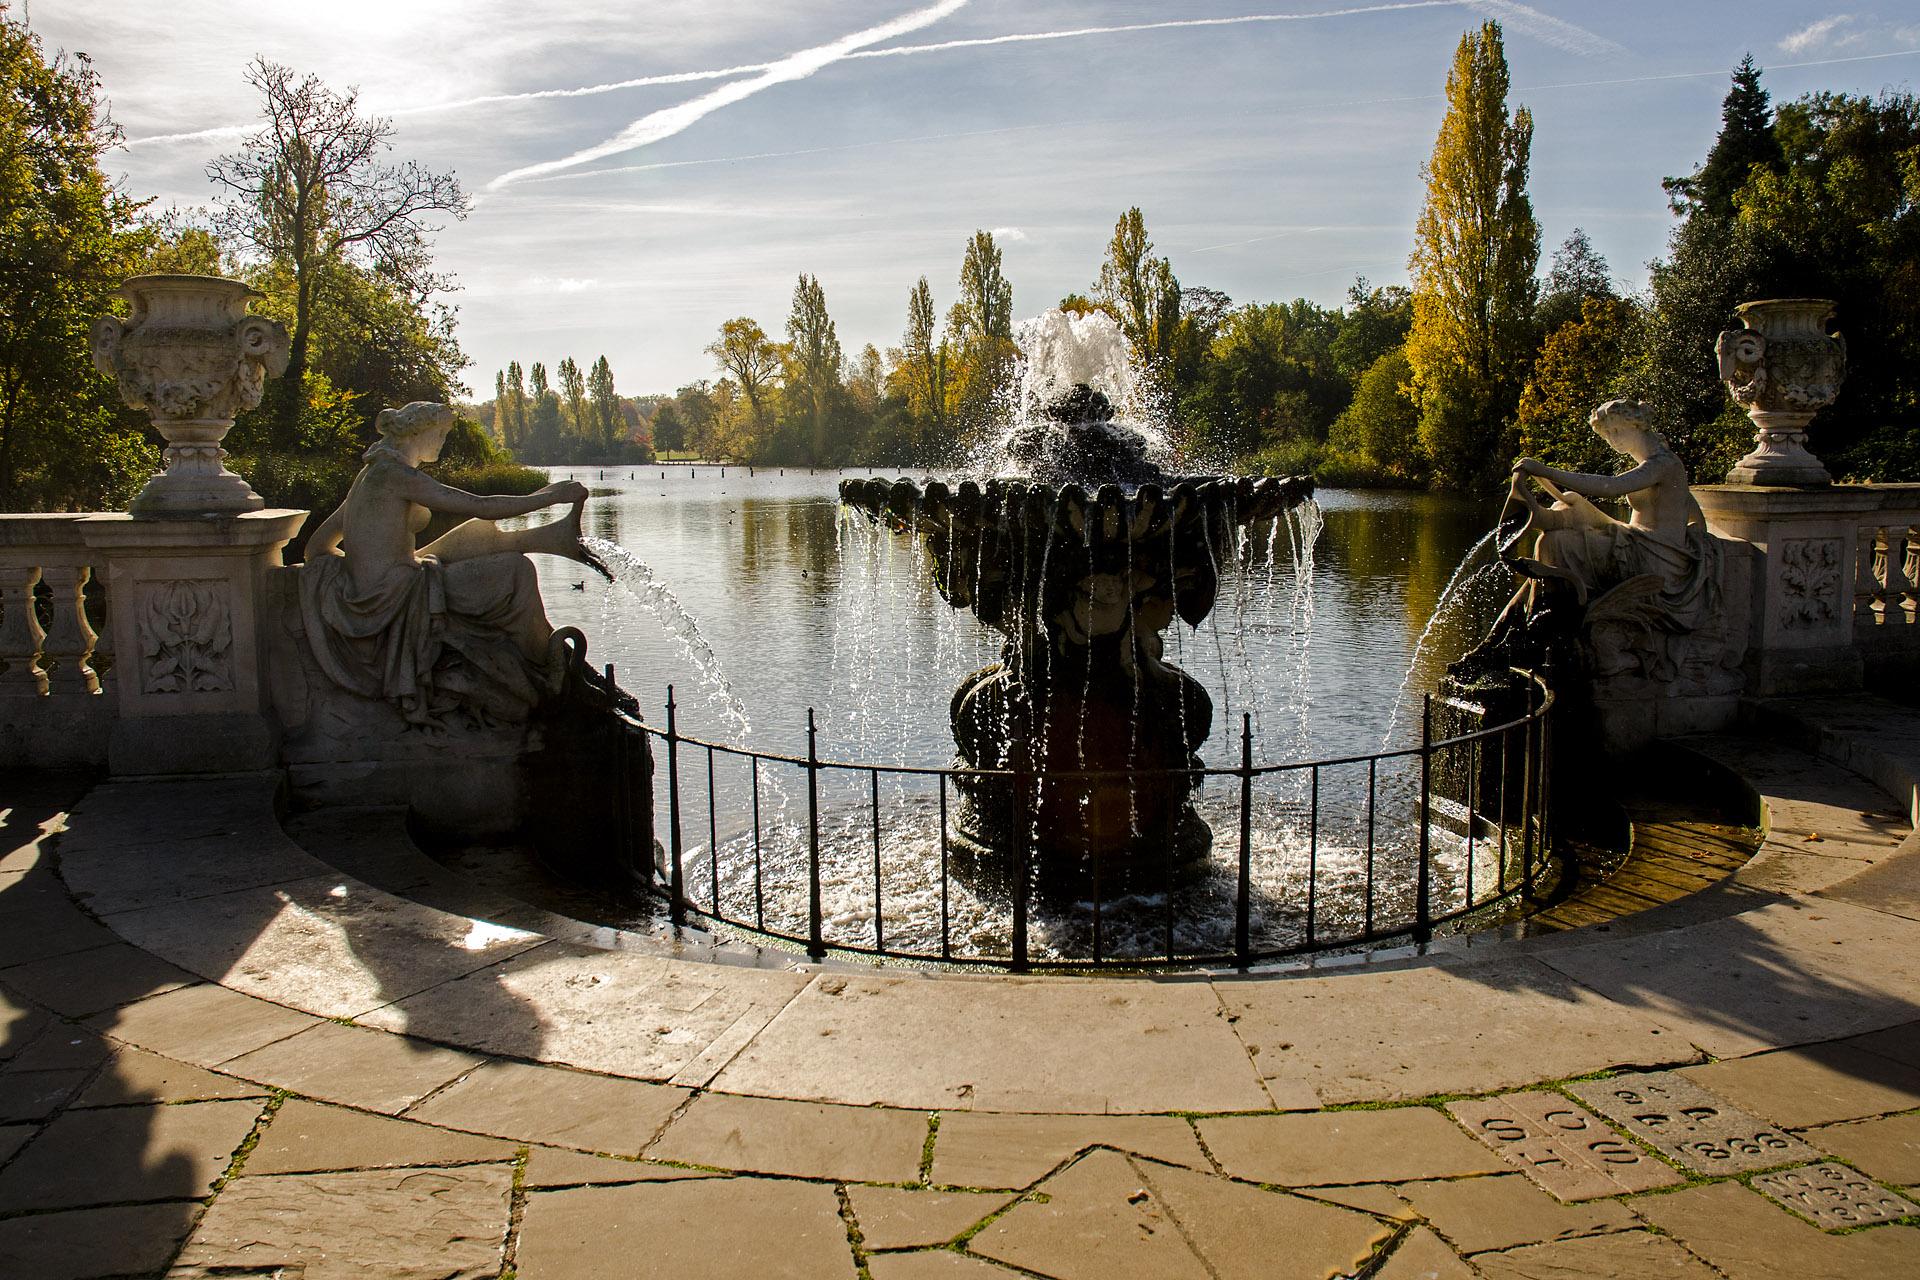 Italian Gardens (Kensington Gardens)